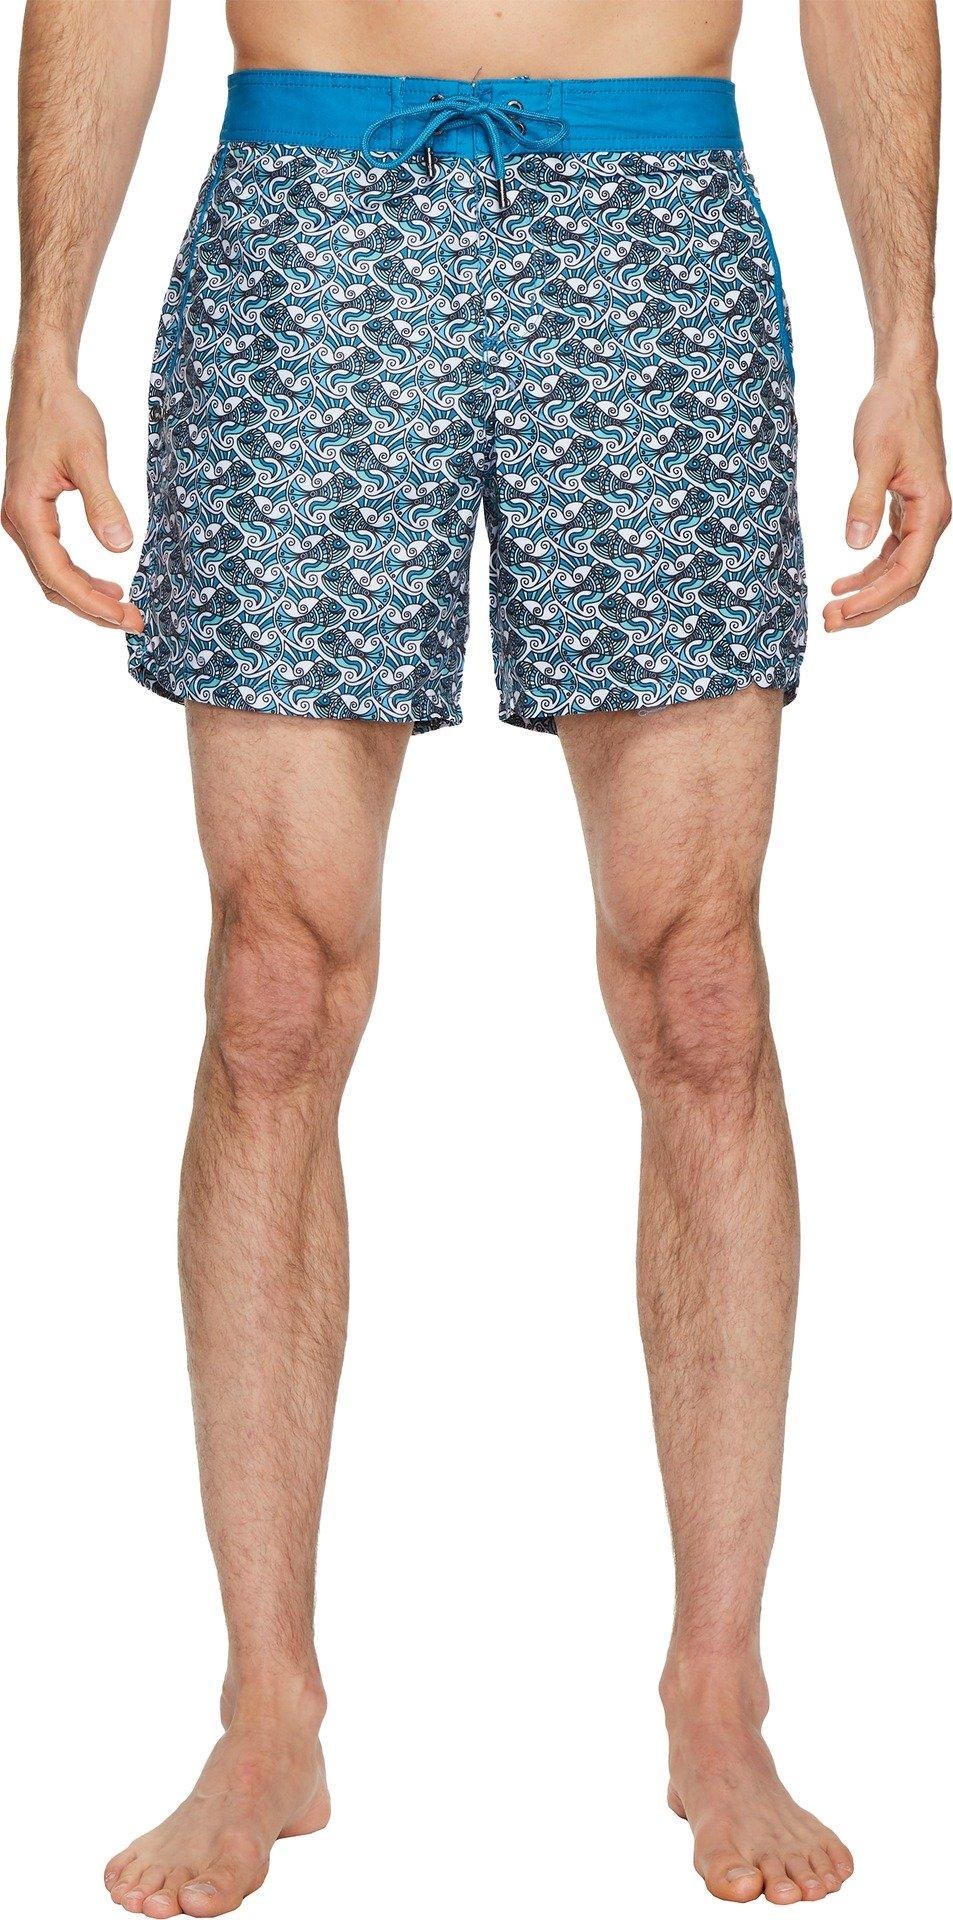 Mr. Swim Men's Swim Trunk, Teal, 30